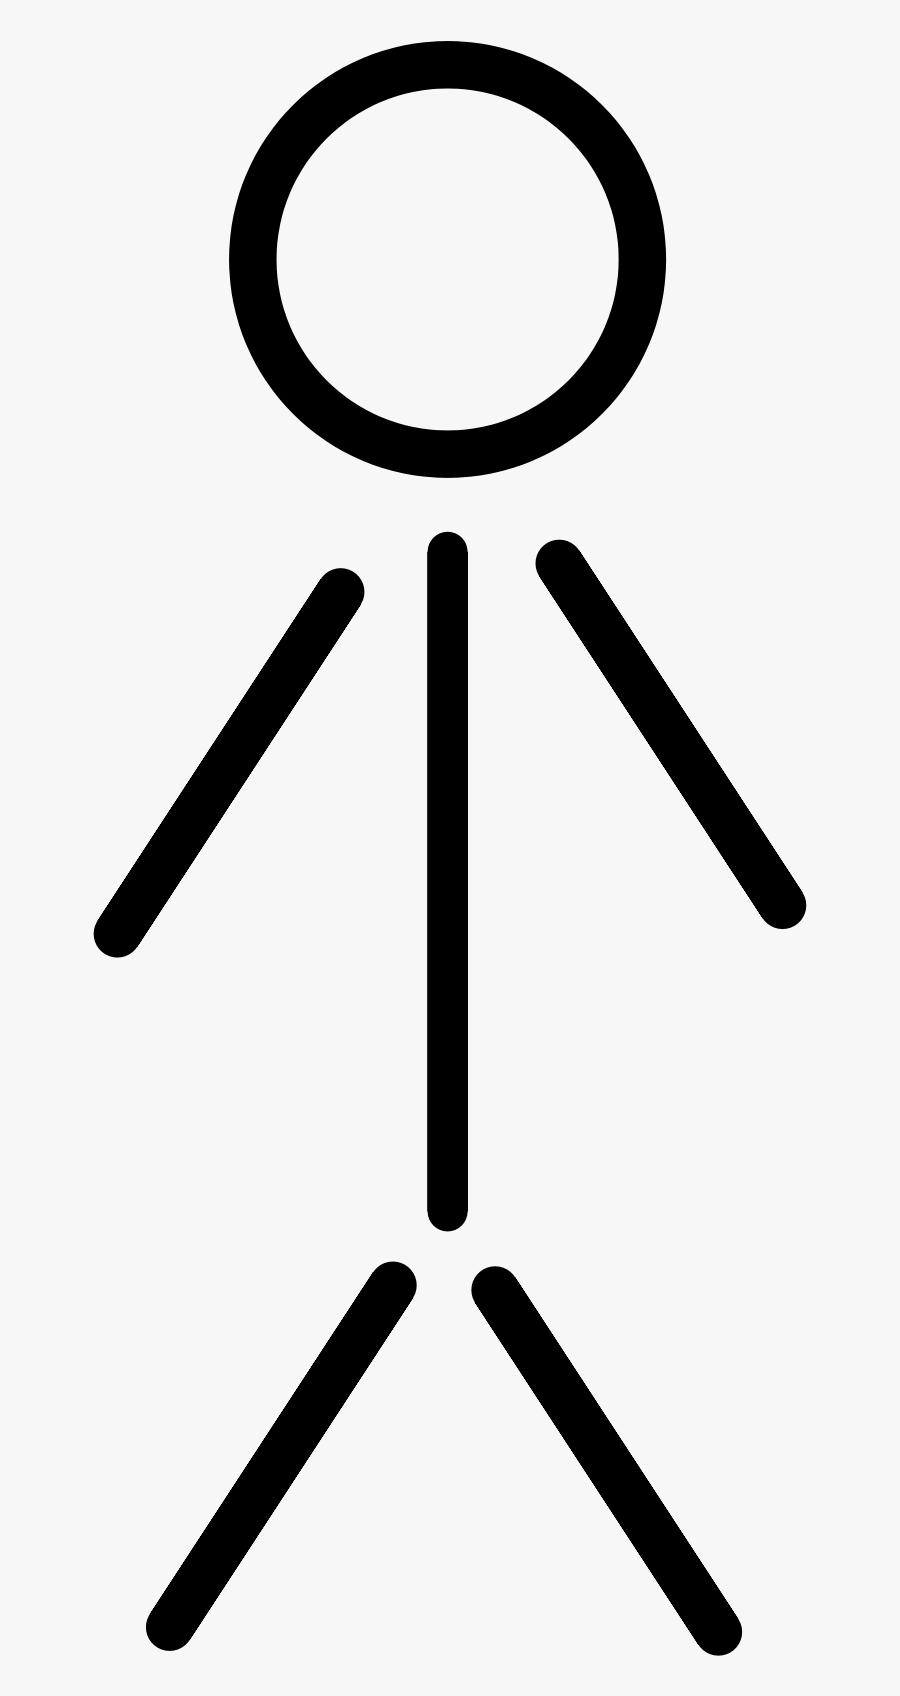 Thumb Image - Clipart Stick Figure, Transparent Clipart